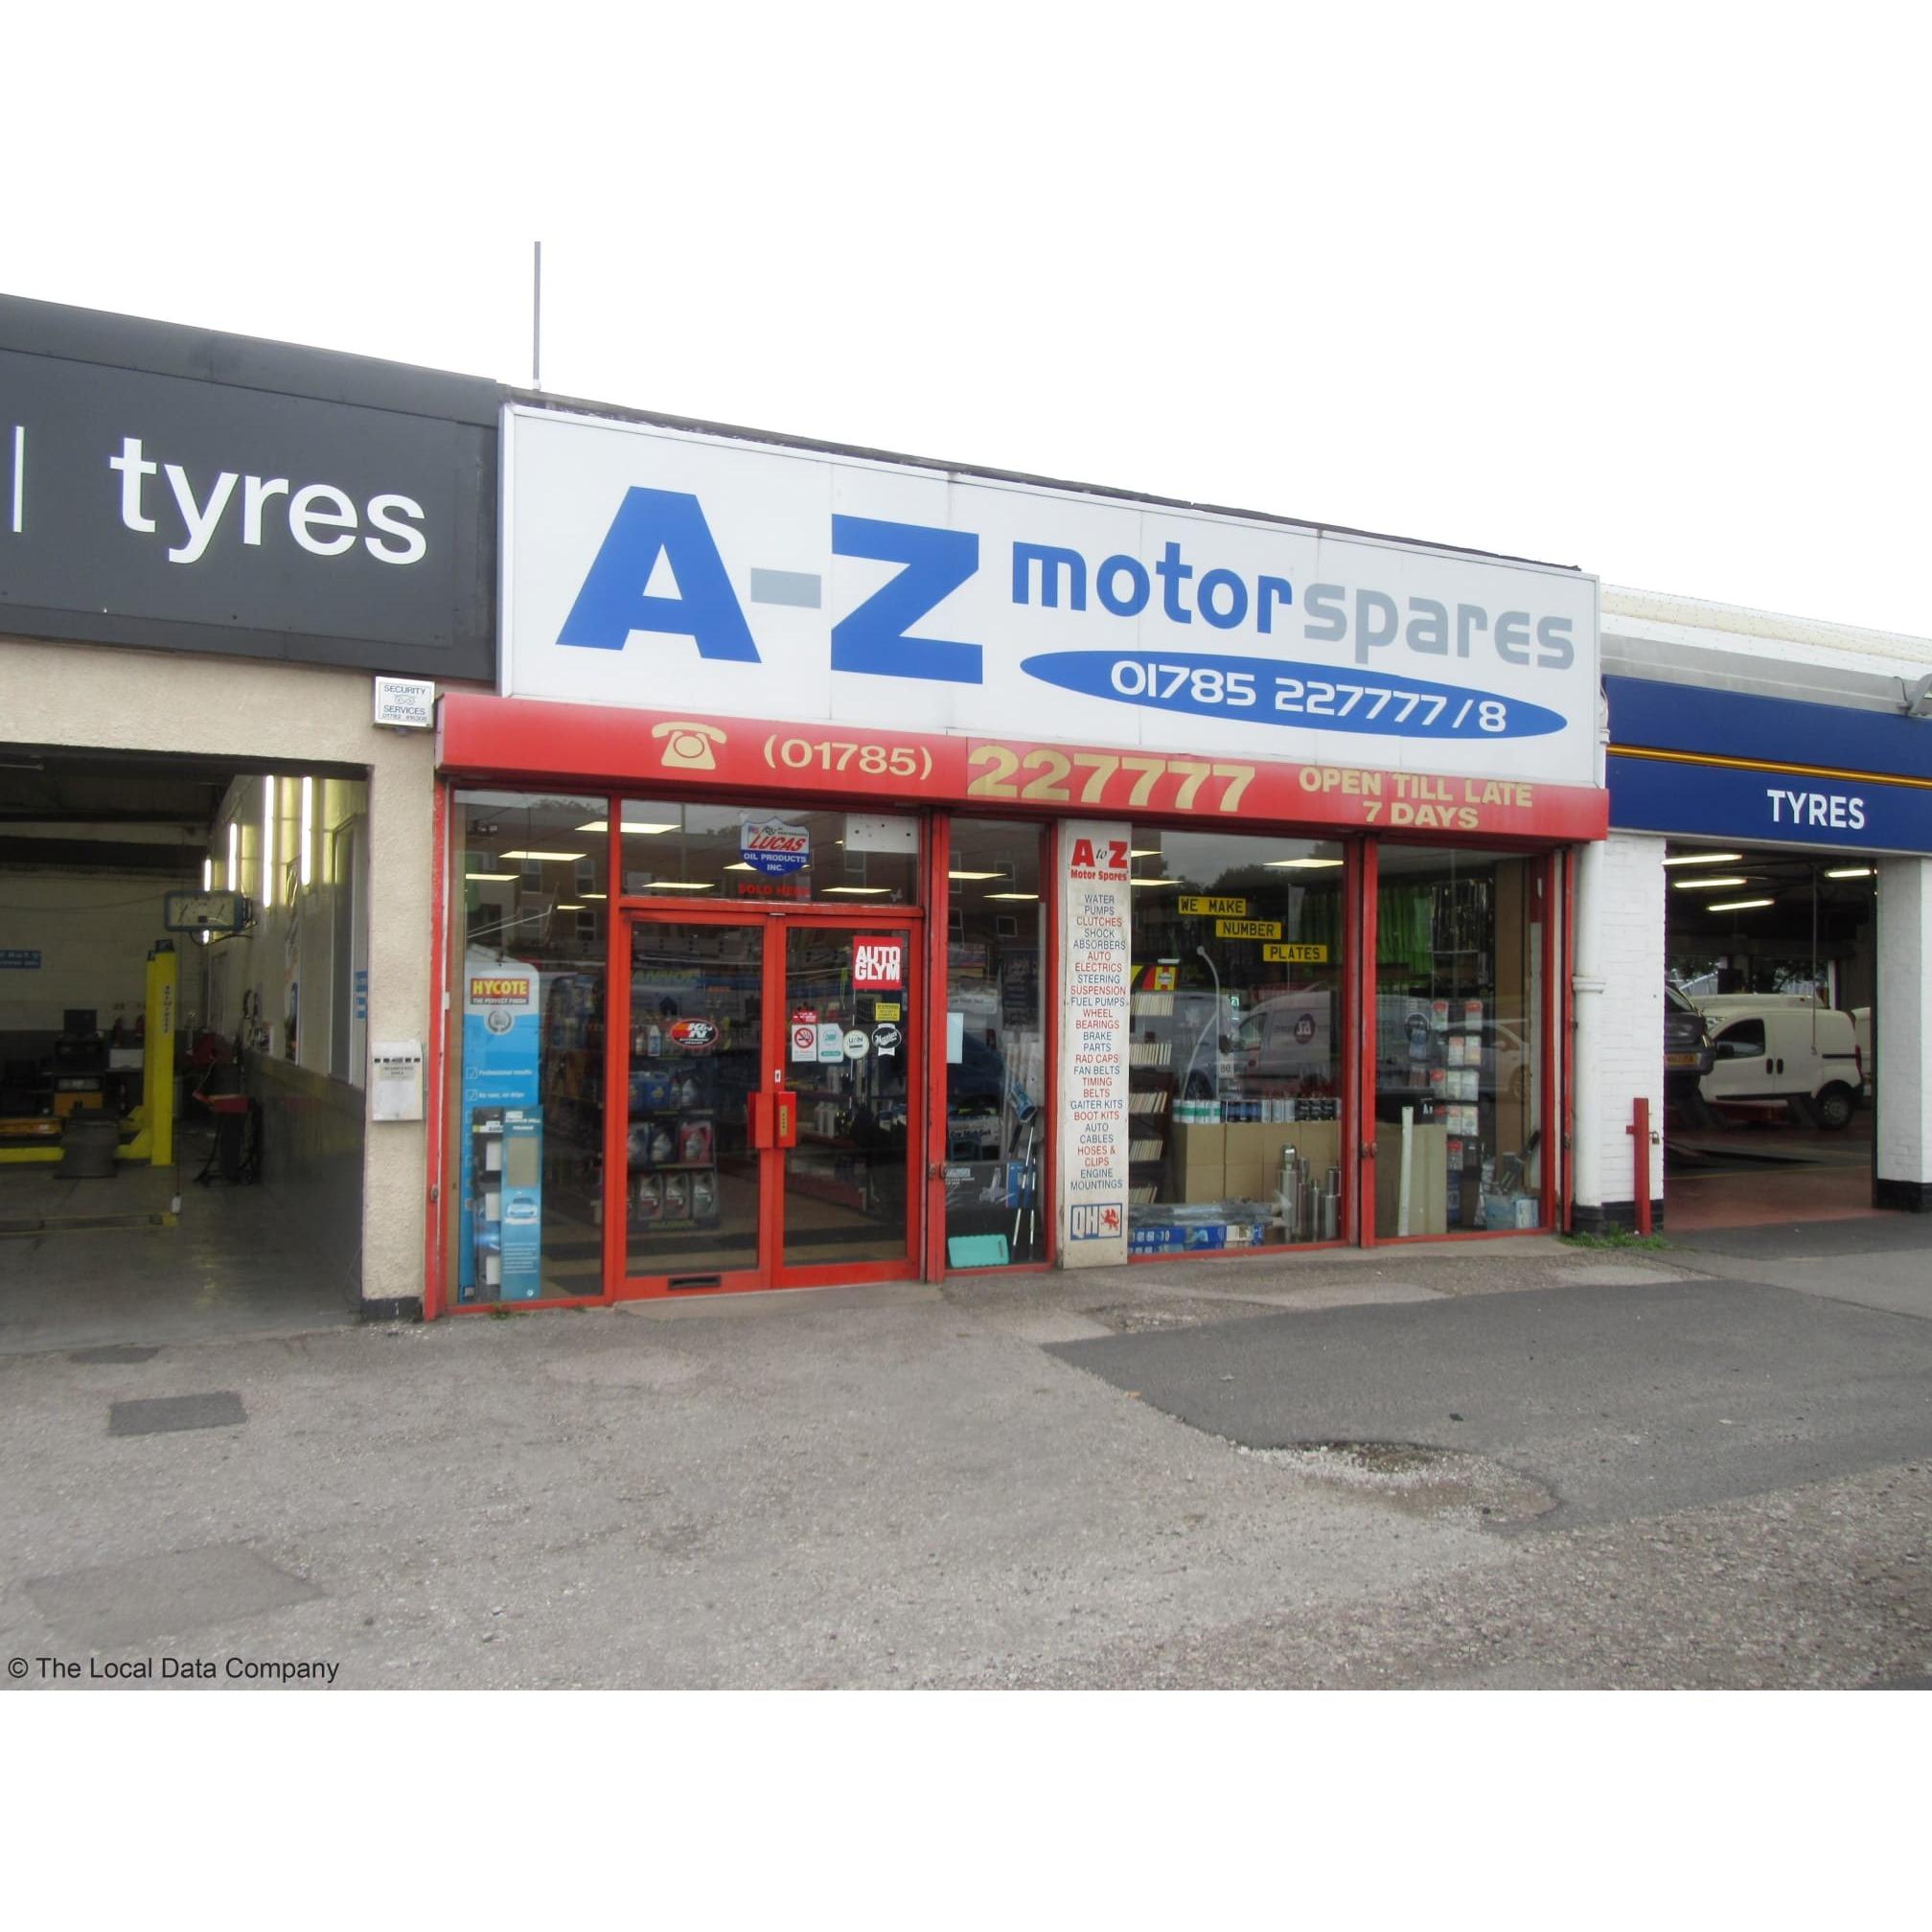 A To Z Motor Spares (Stafford)